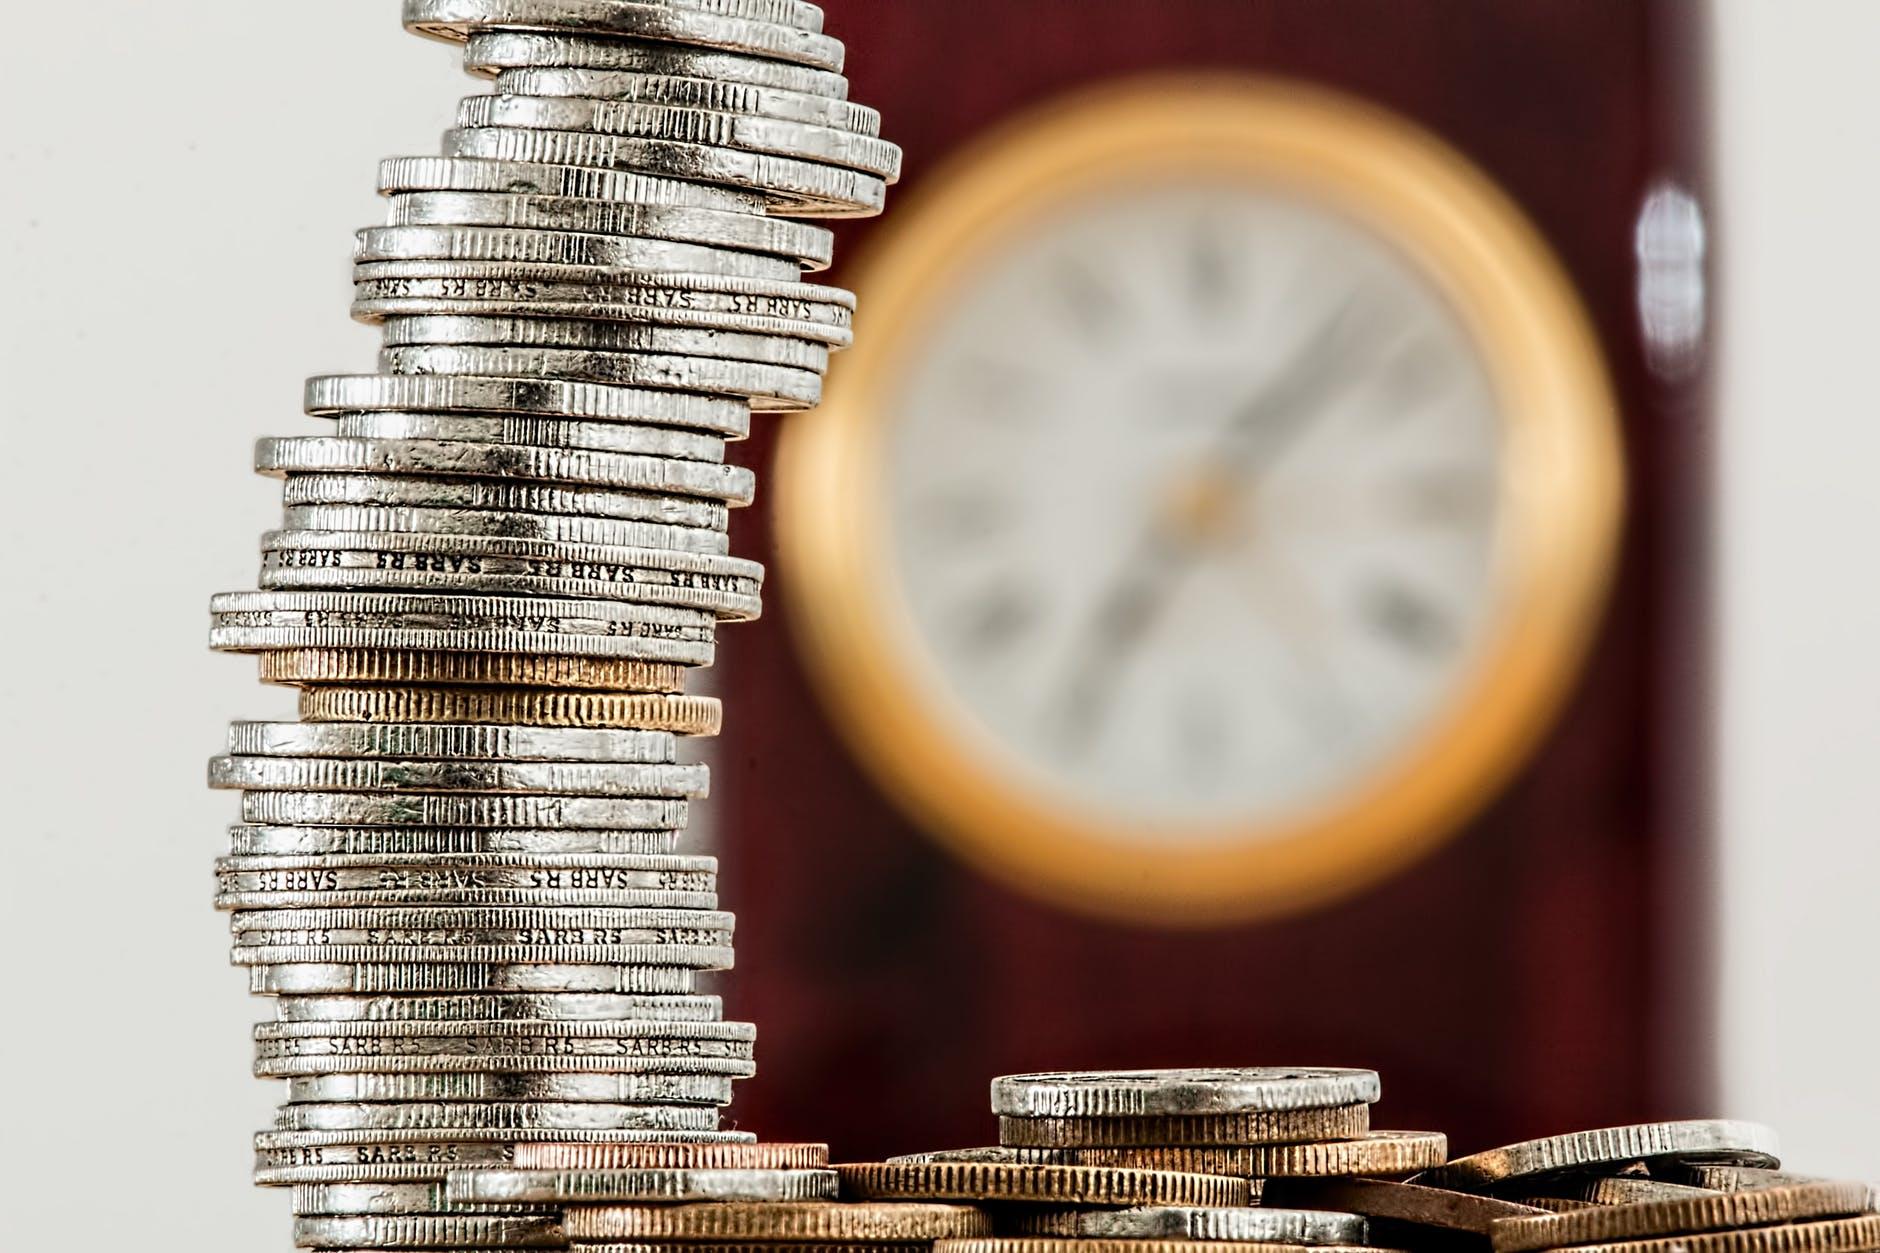 https://ekaenlinea.com/wp-content/uploads/2018/06/coins-currency-investment-insurance-128867.jpeg